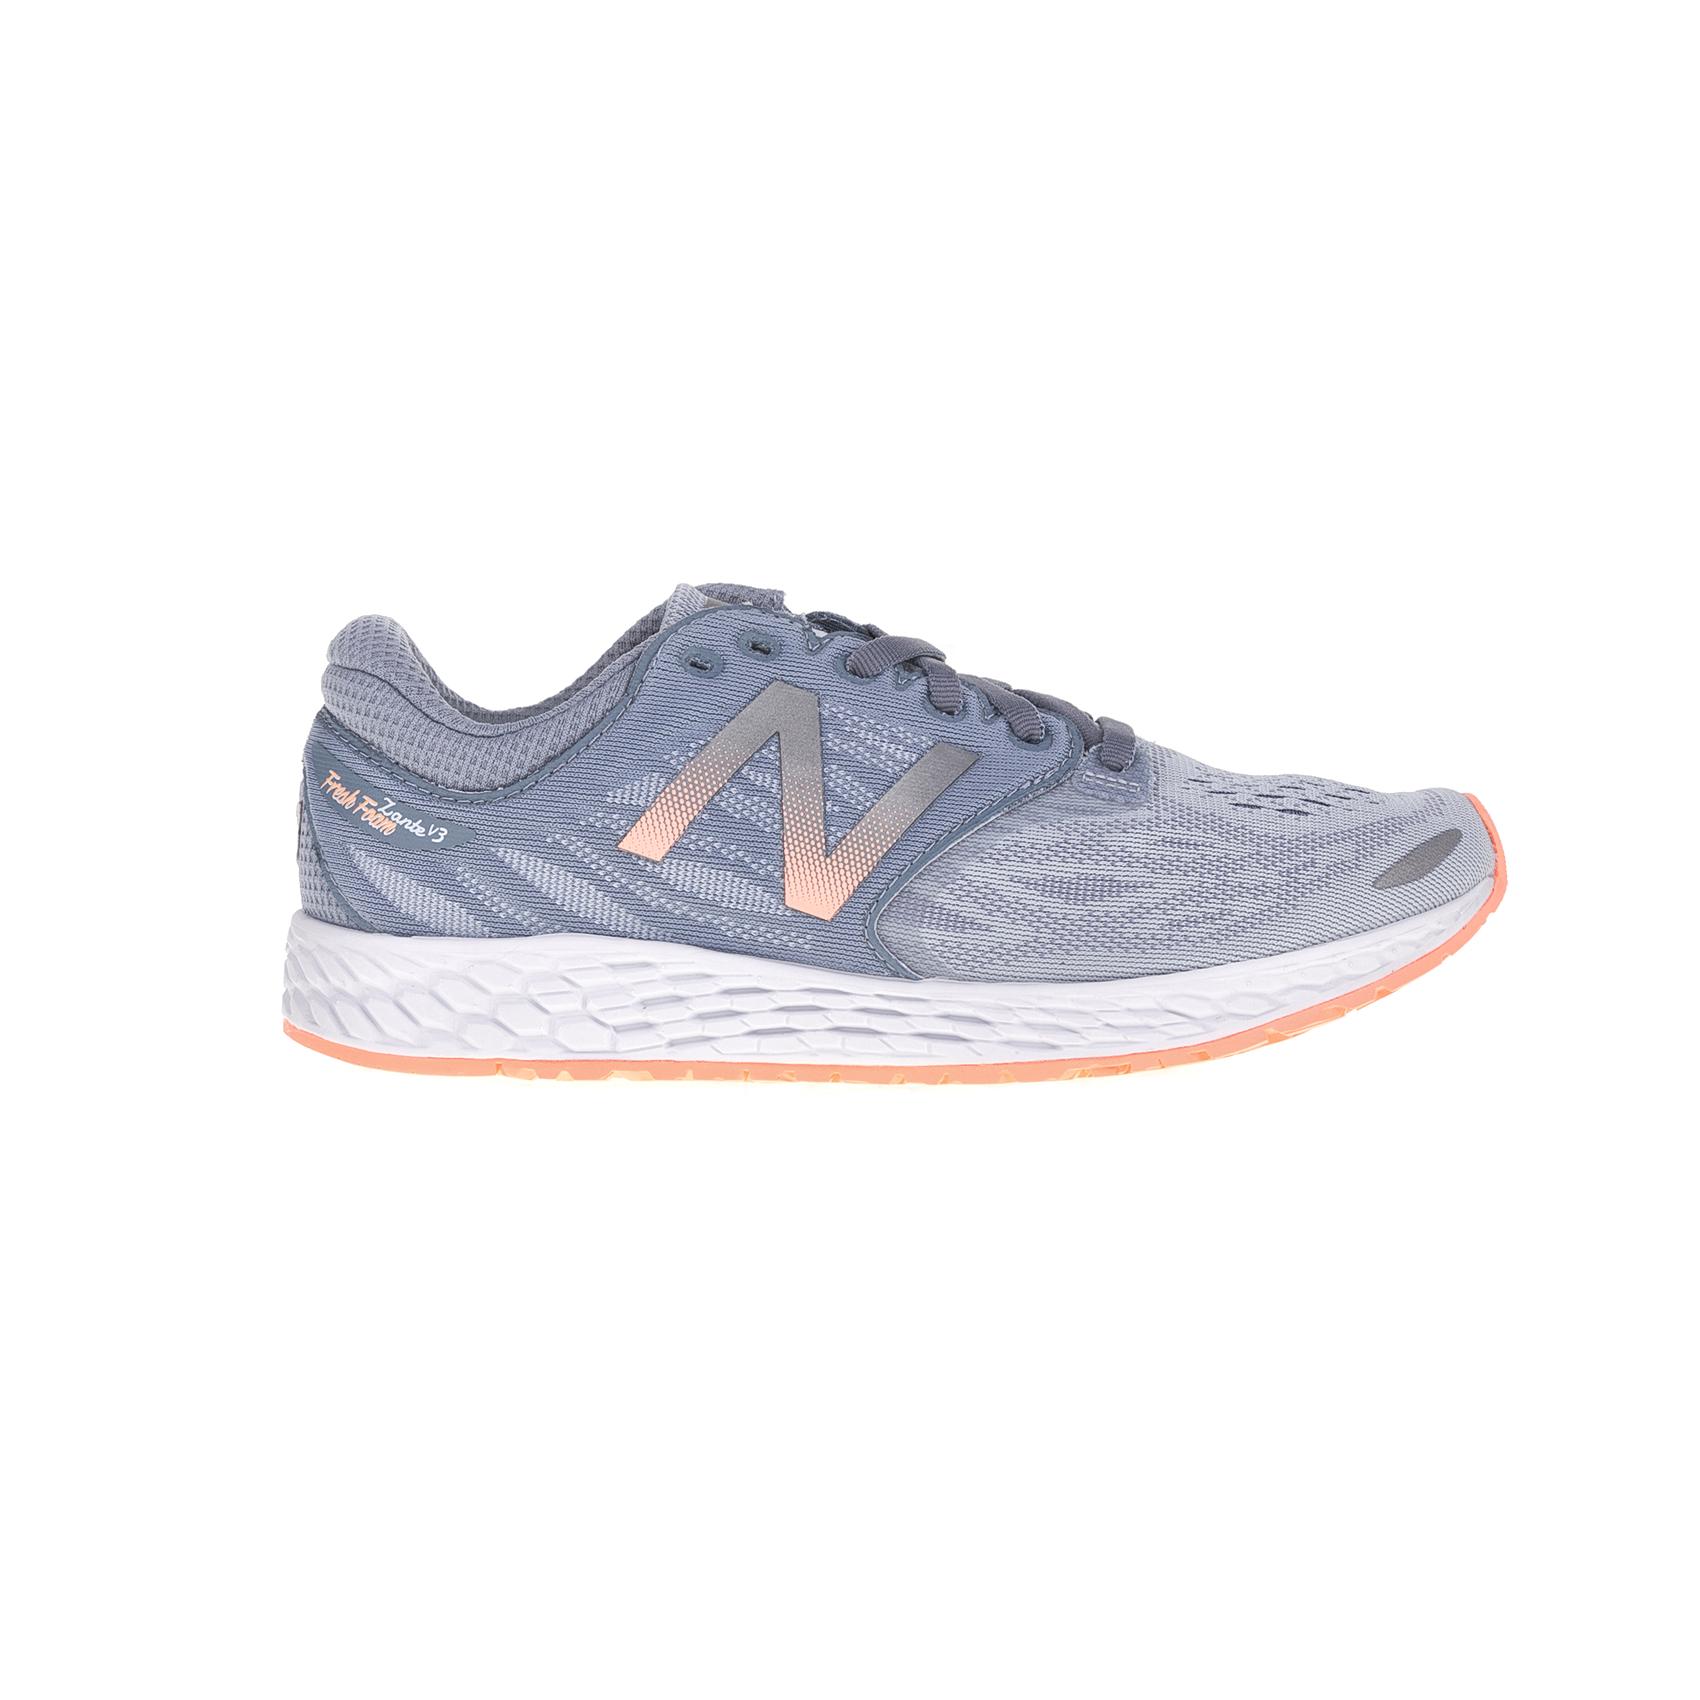 NEW BALANCE - Γυναικεία παπούτσια για τρέξιμο NEW BALANCE Fresh Foam Zante γκρι γυναικεία παπούτσια αθλητικά running